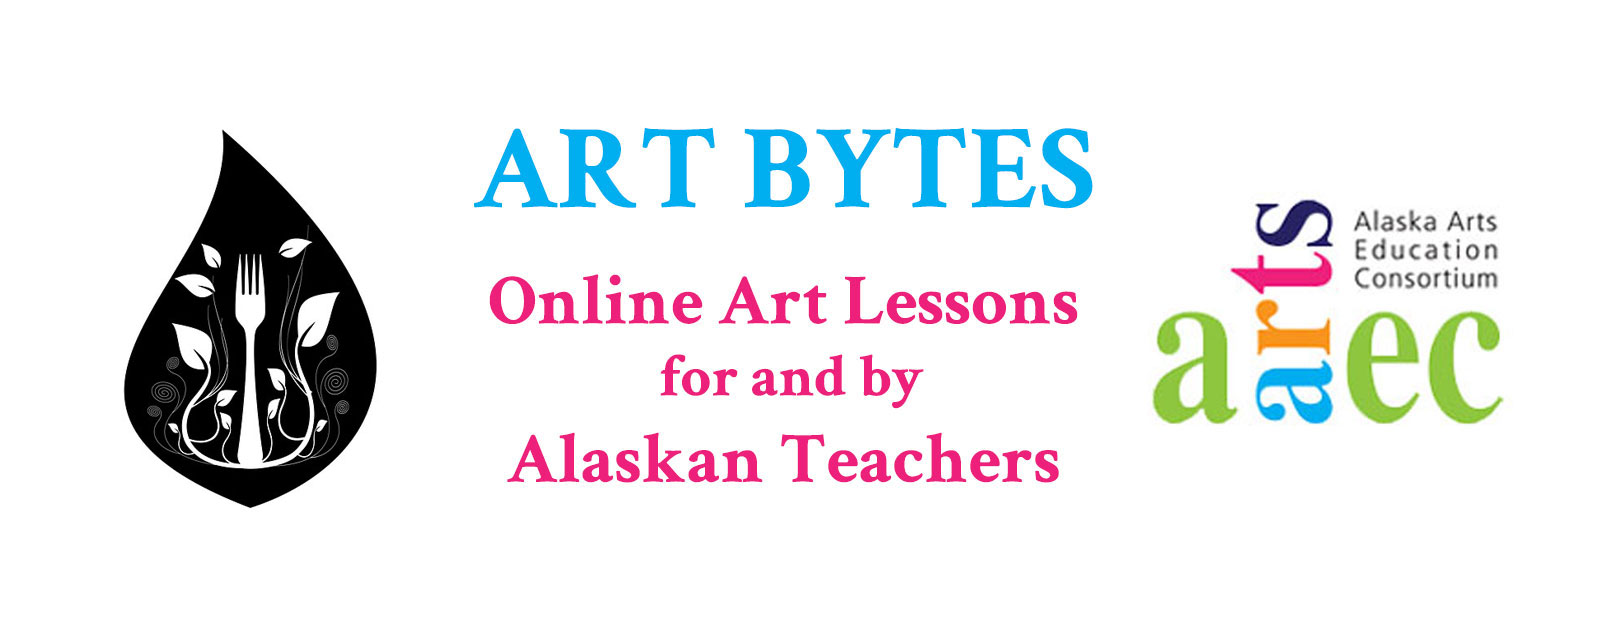 Art Bytes- Art Lessons For and By Alaskan Teachers